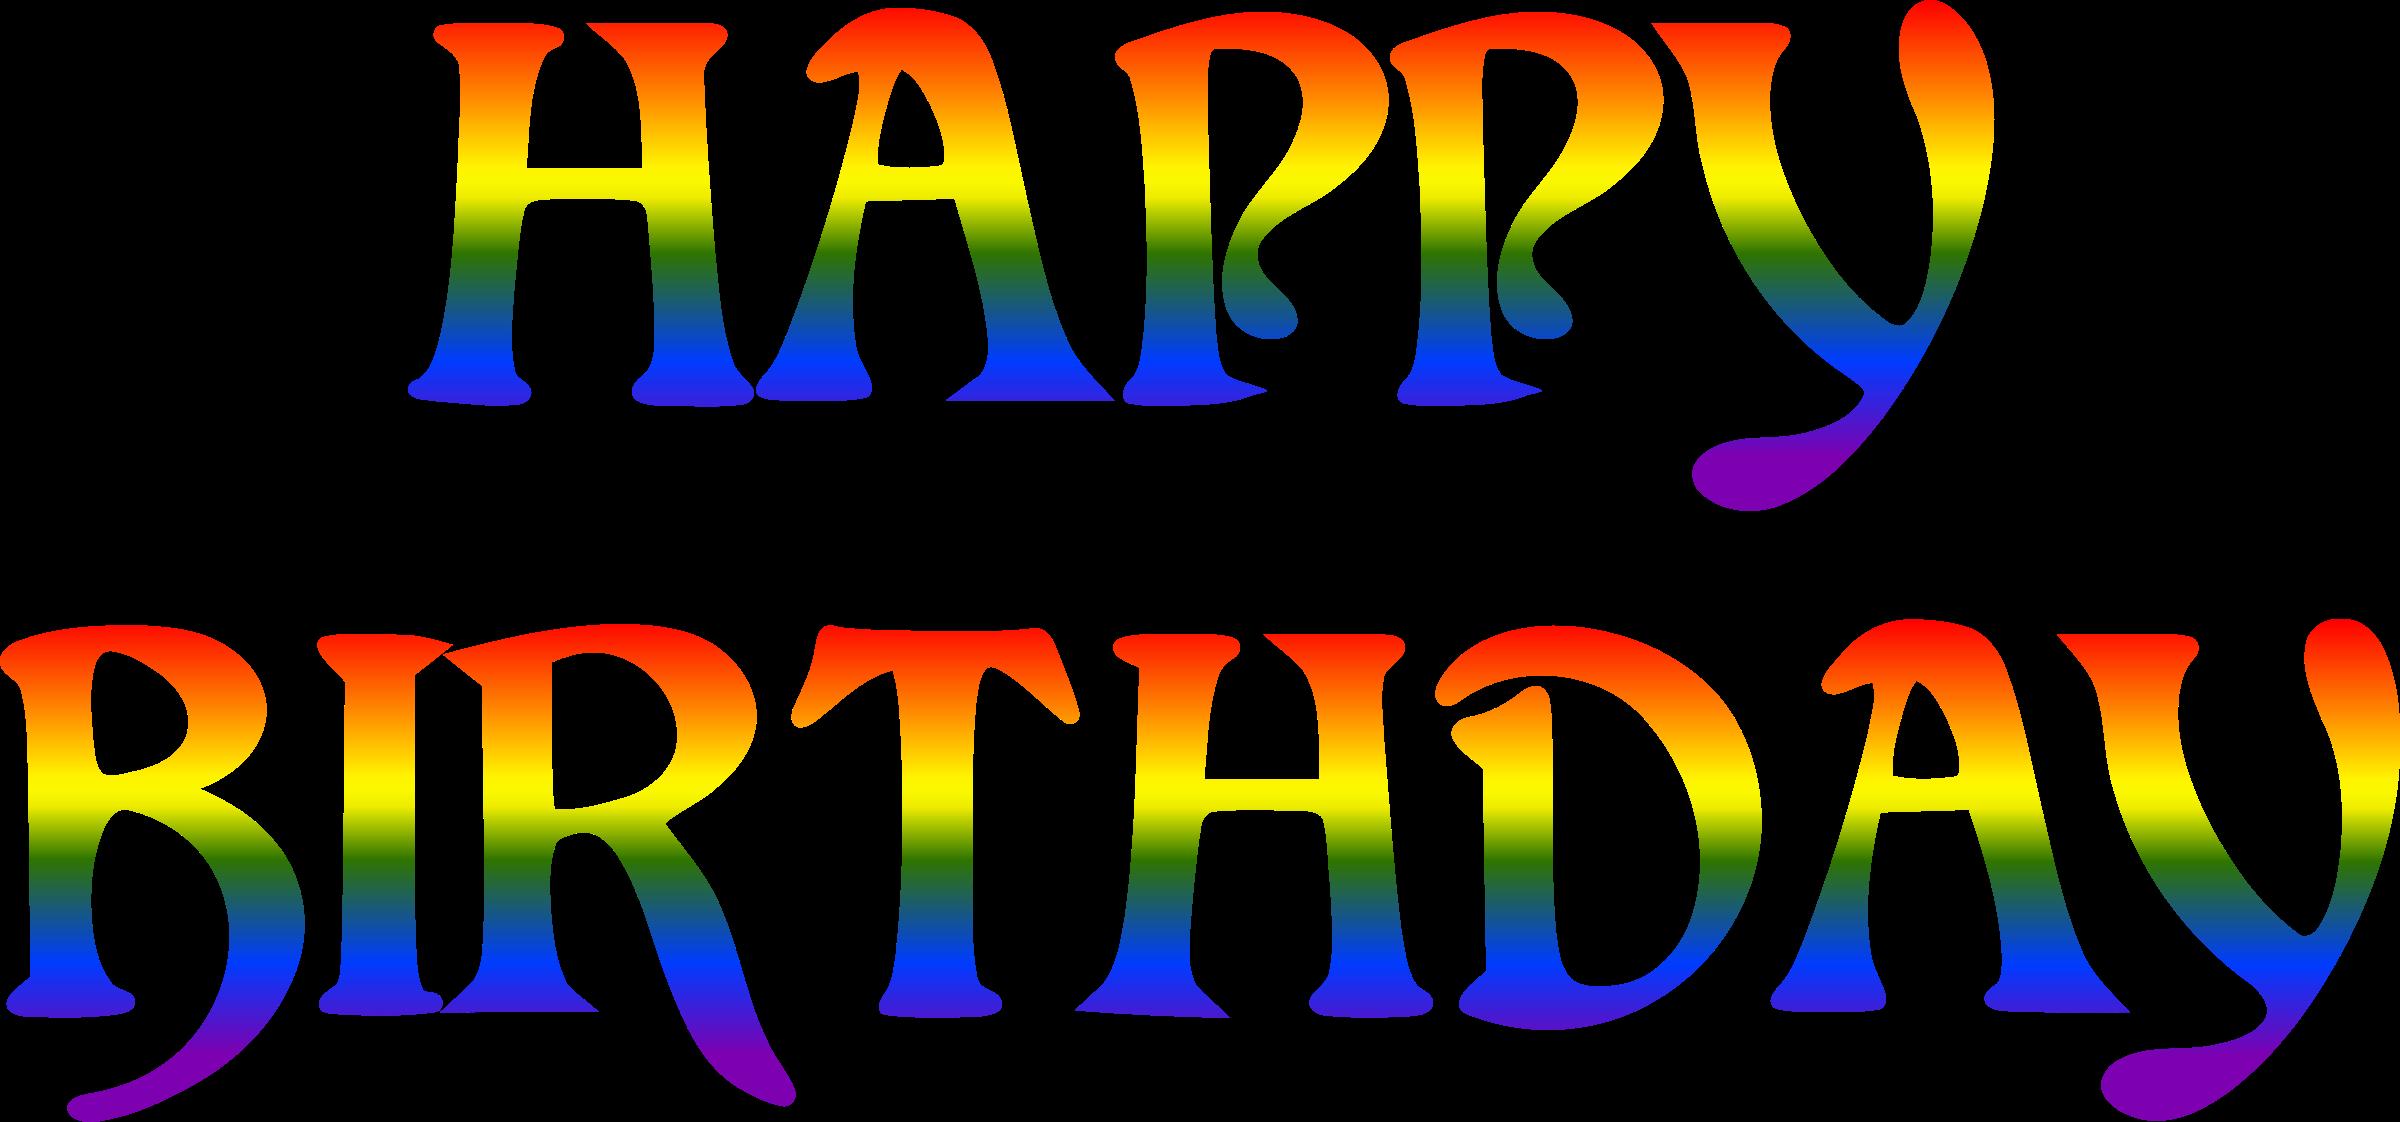 Clipart rainbow happy birthday. Typography big image png